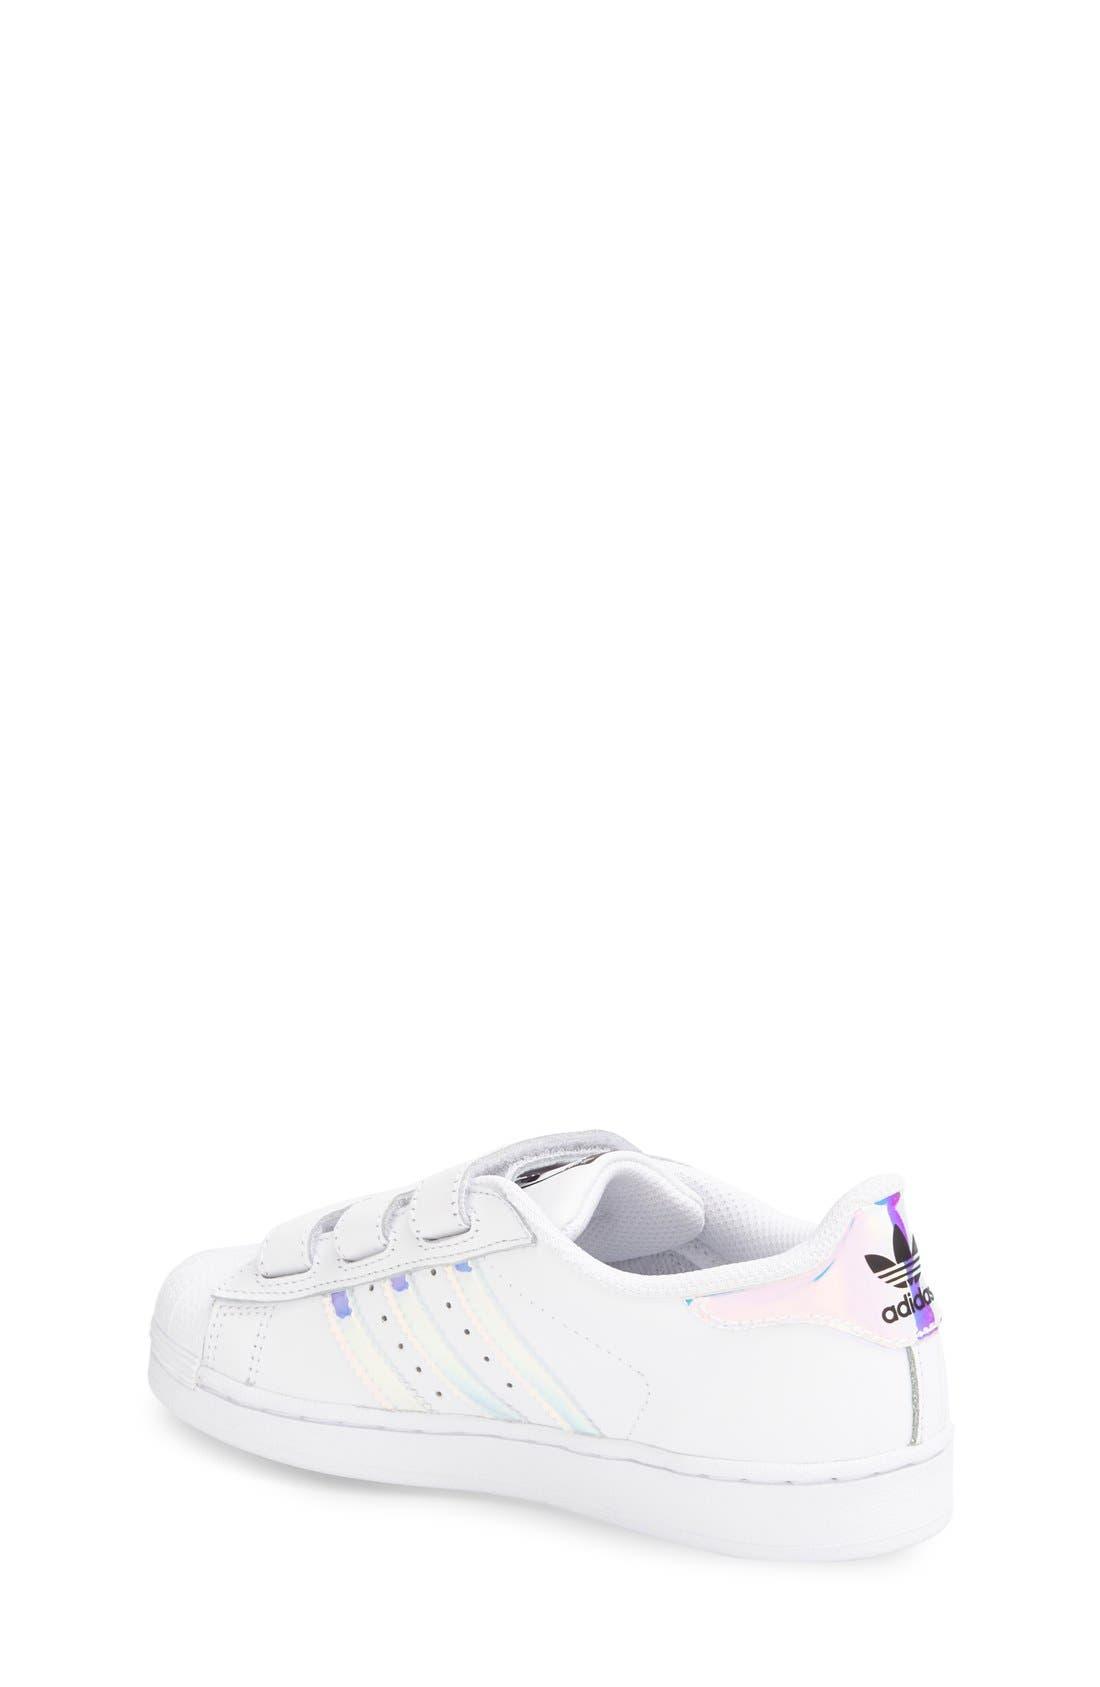 Superstar - Iridescent Sneaker,                             Alternate thumbnail 9, color,                             SILVER METALLIC/ WHITE